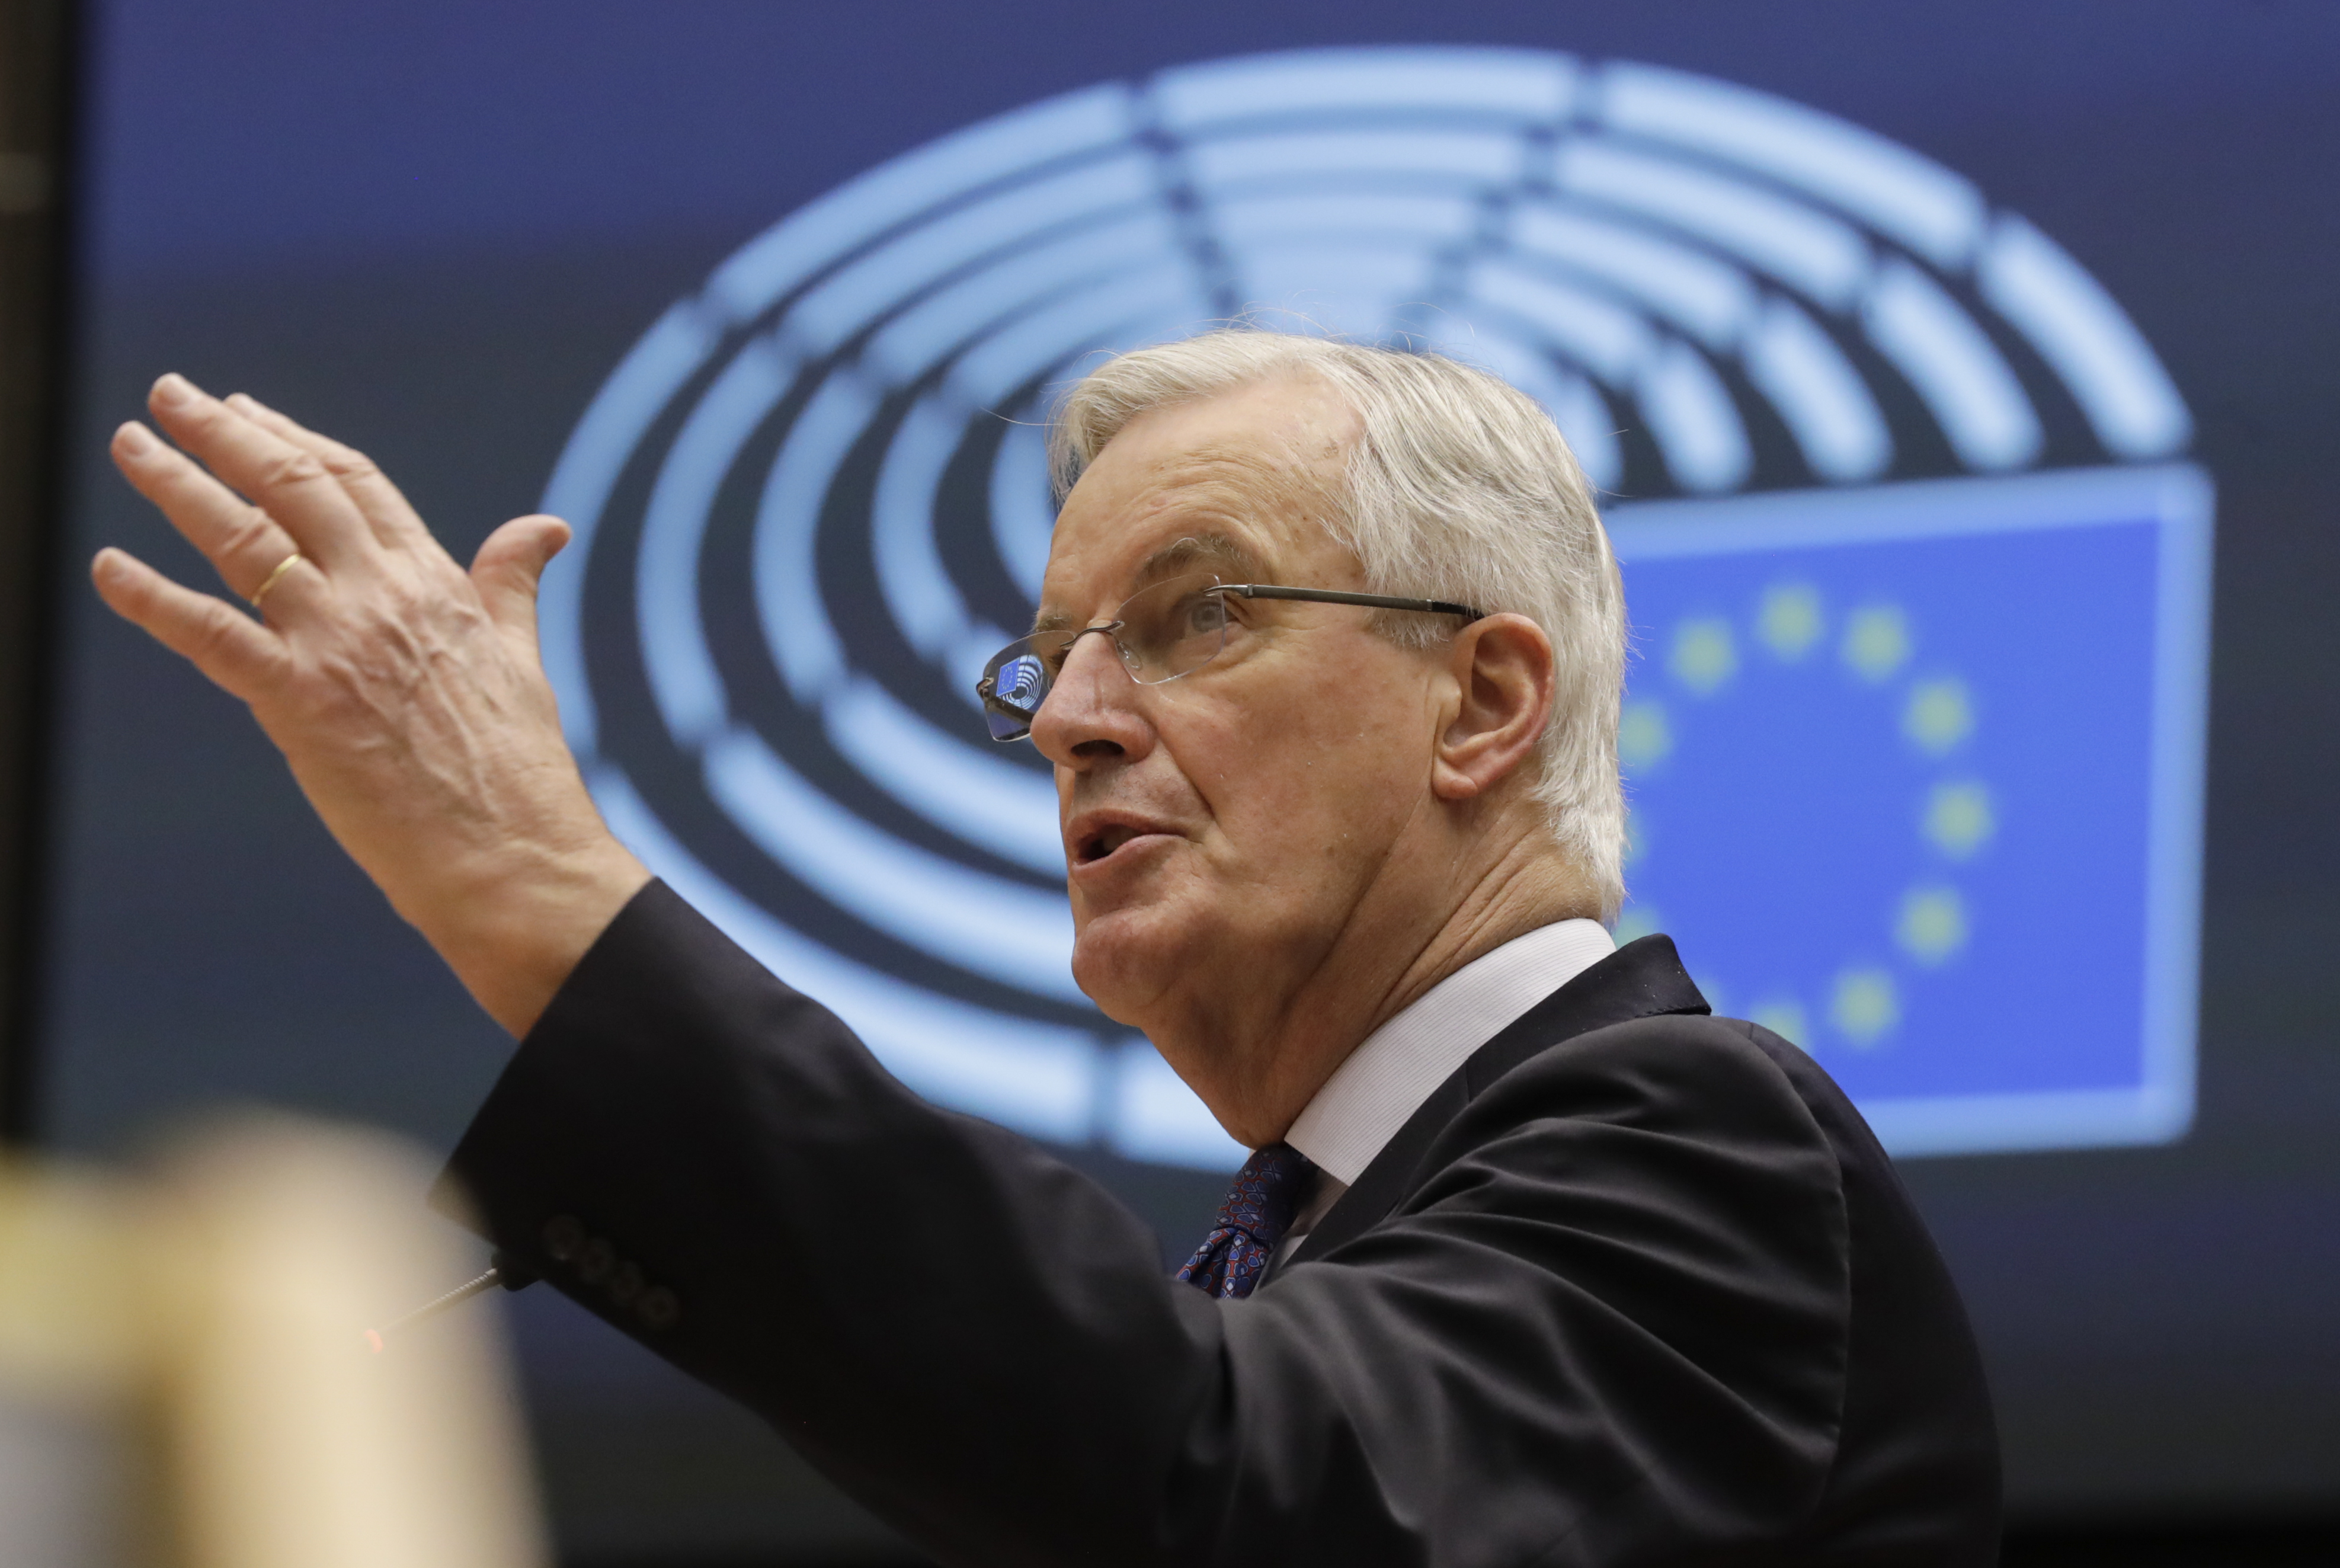 United Kingdom says chances of Brexit trade deal below 50%, despite European Union optimism